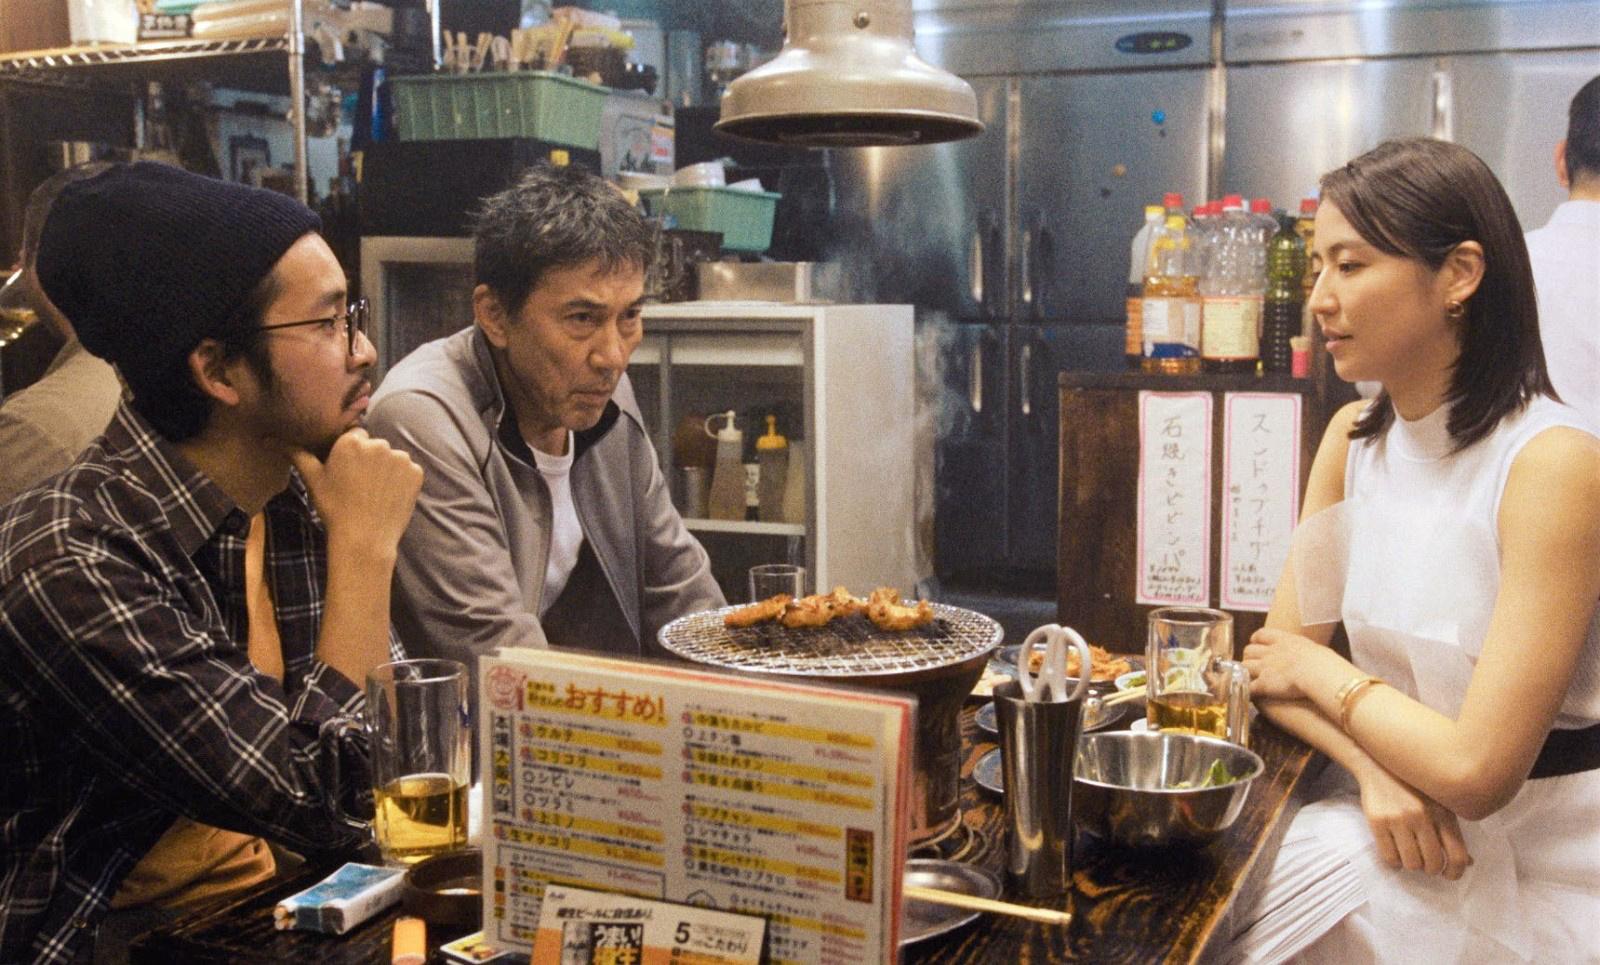 allbetgmaing下载:西川美和新片命名《美妙的天下》 役所广司担主演  第2张